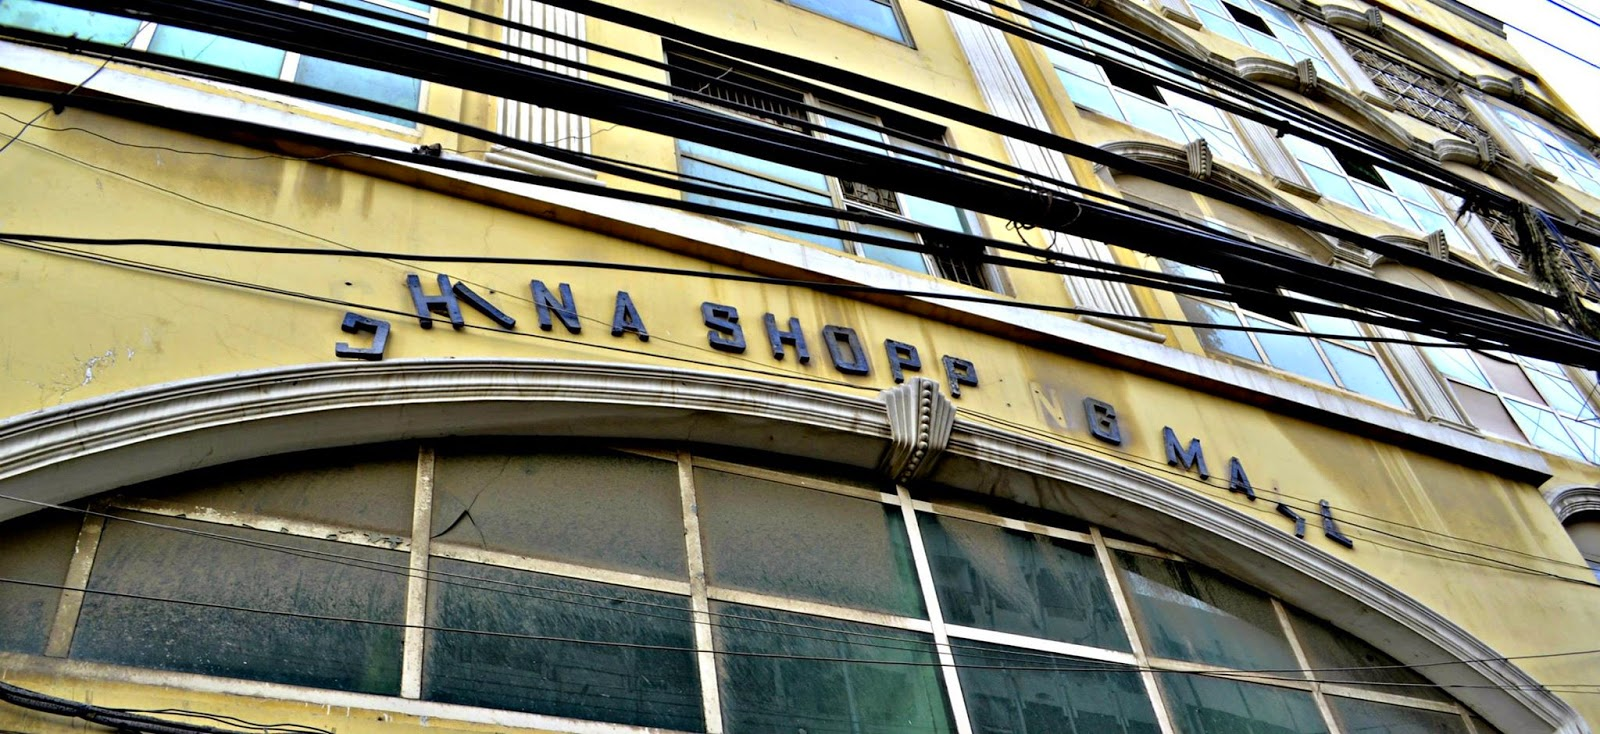 china shopping mall karachi